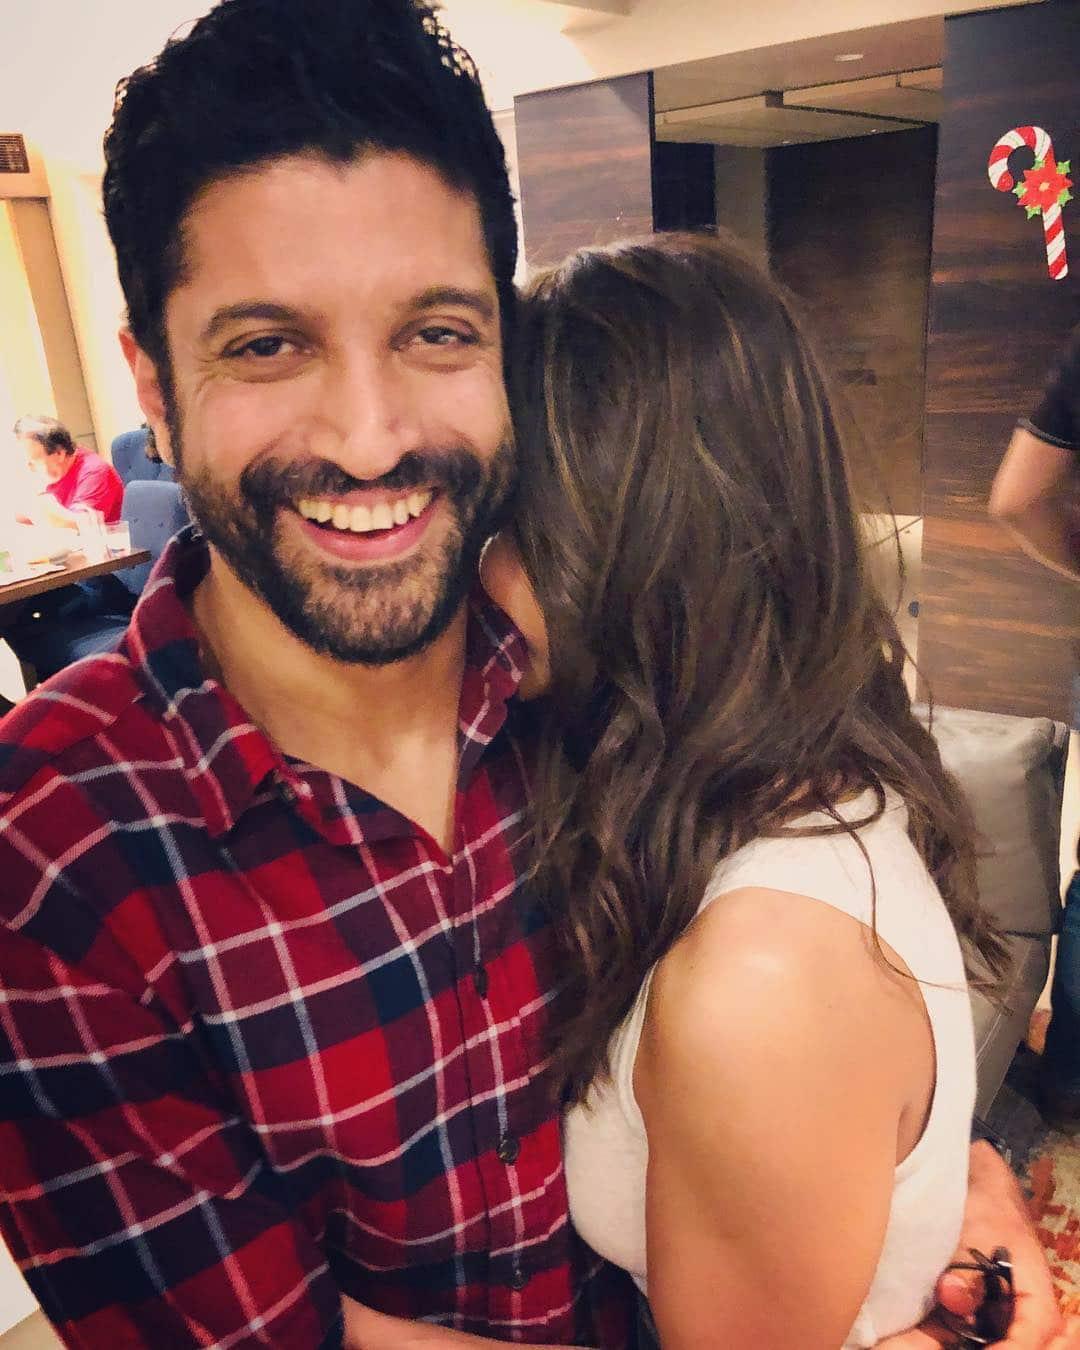 Farhan Akhtar with Girlfriend Photo